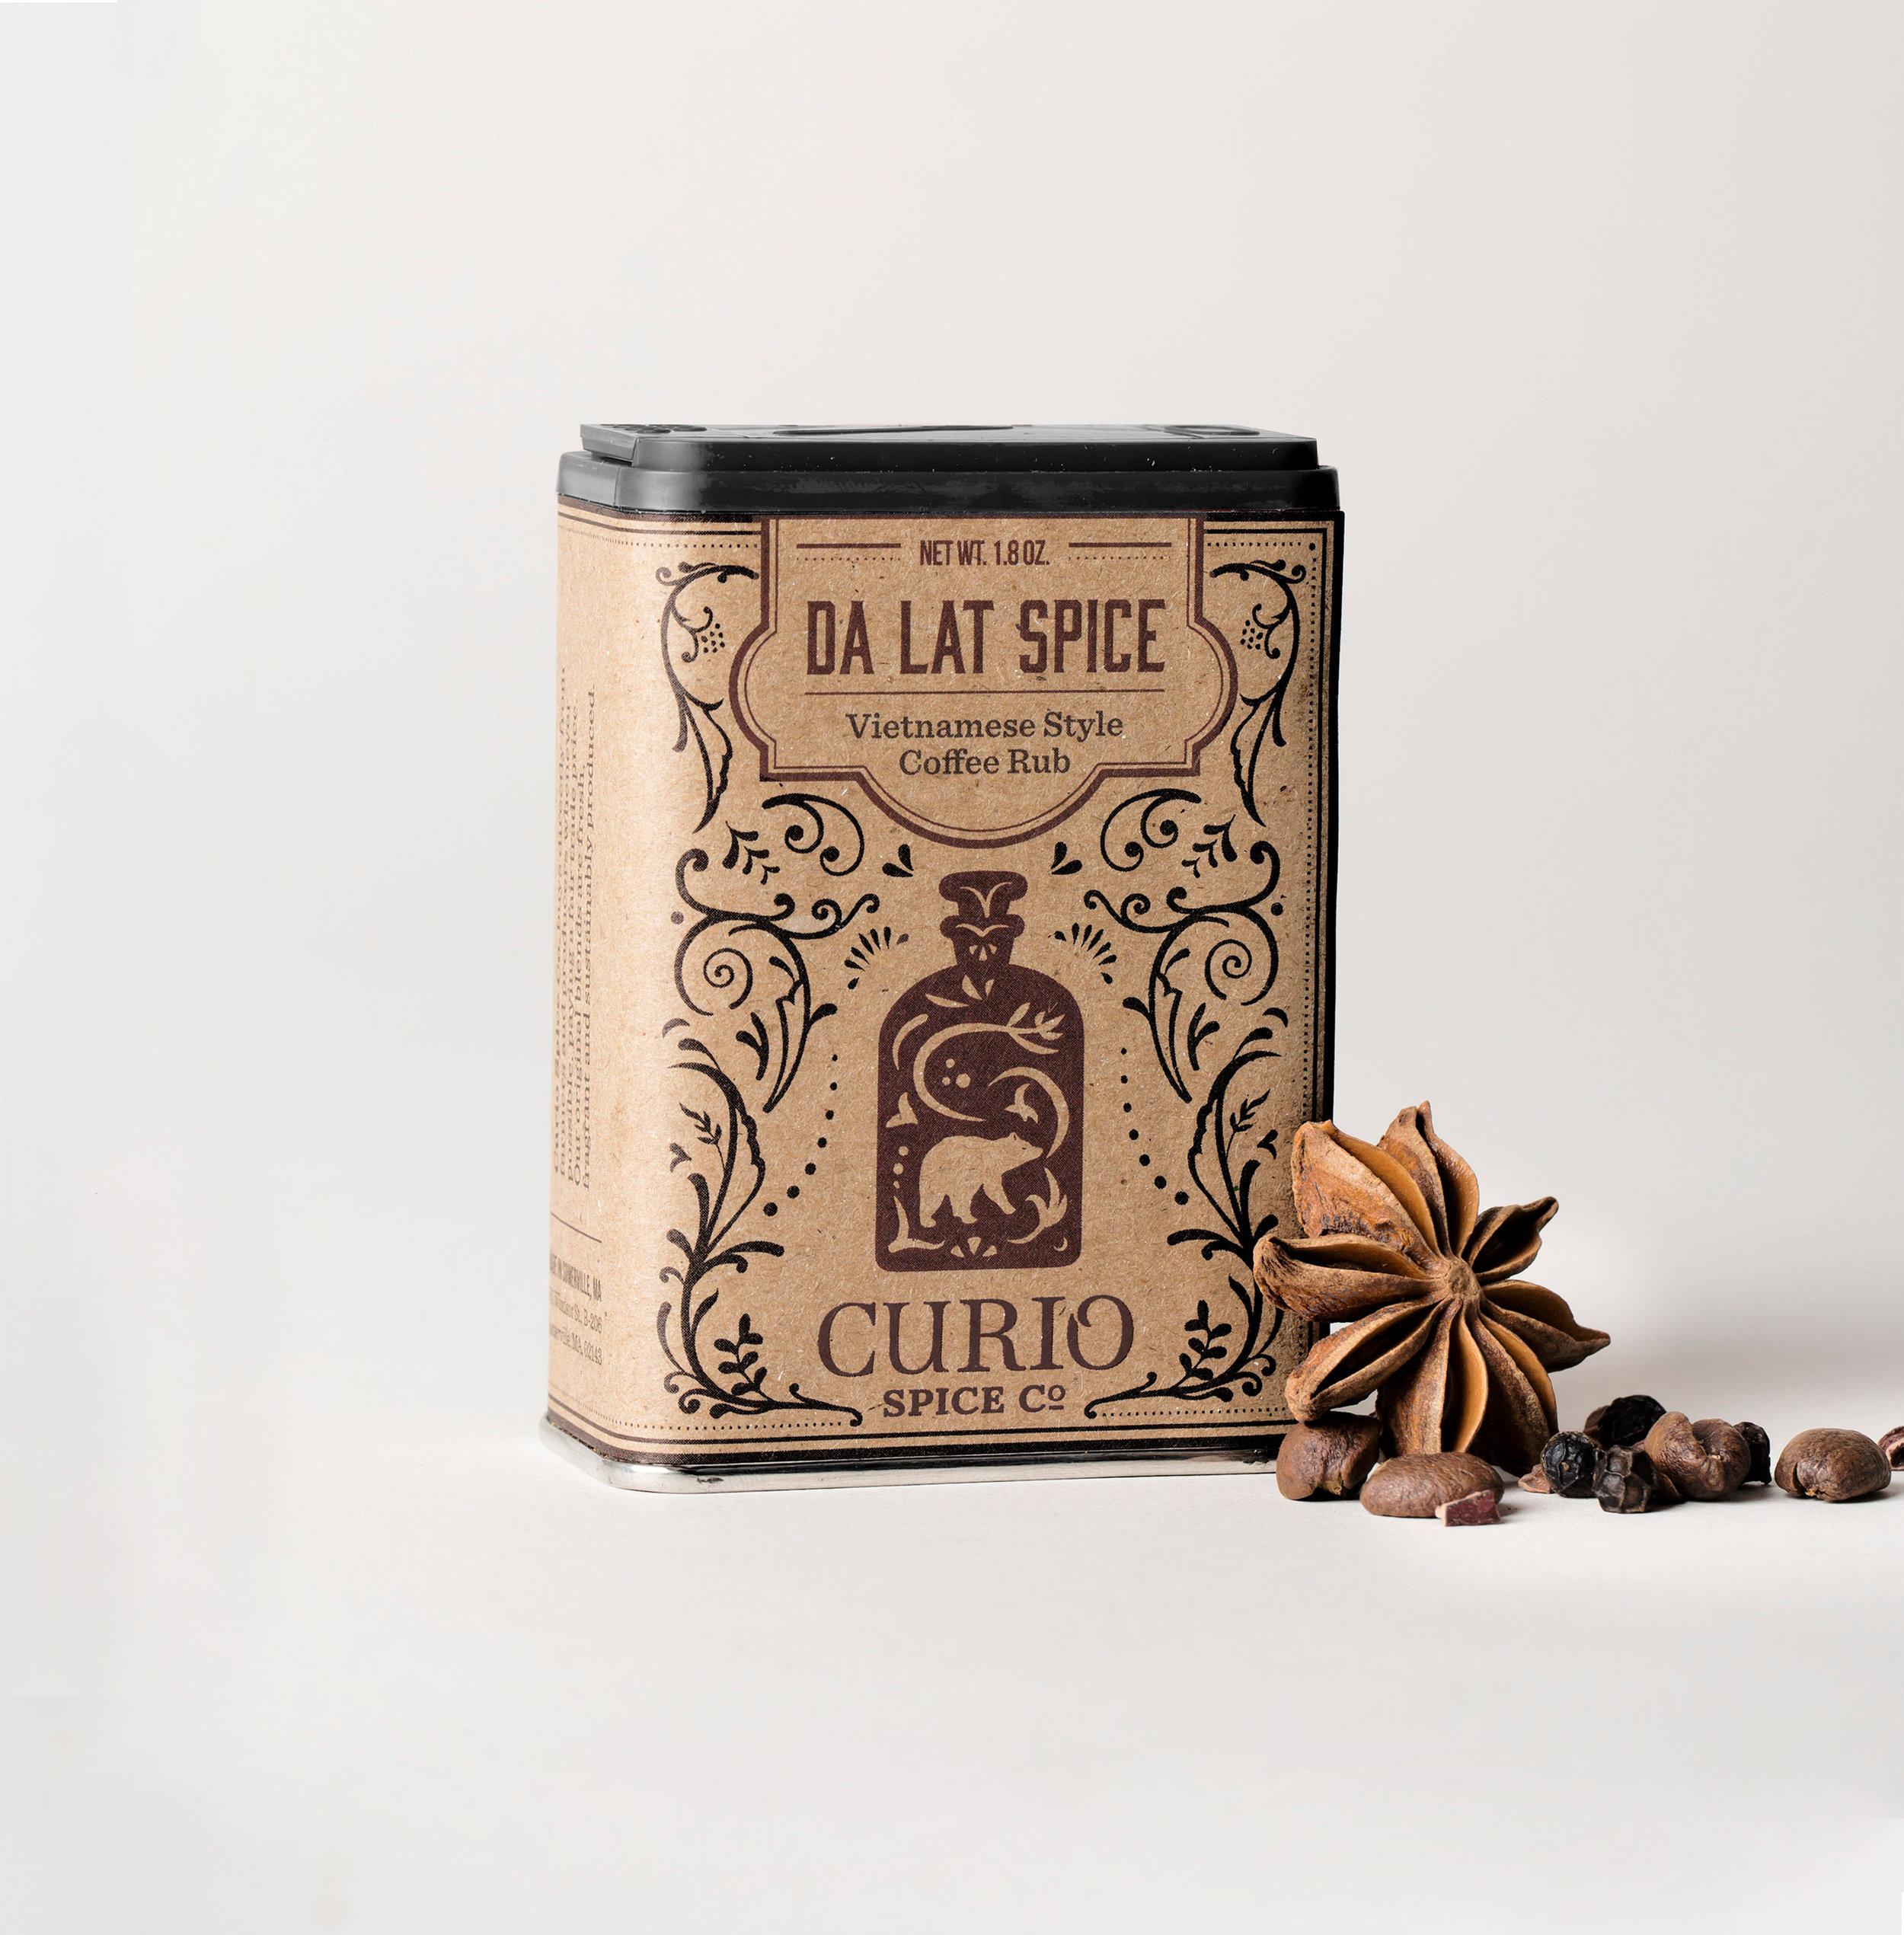 Da Lat Spice - a bold Vietnamese style coffee & spice rub